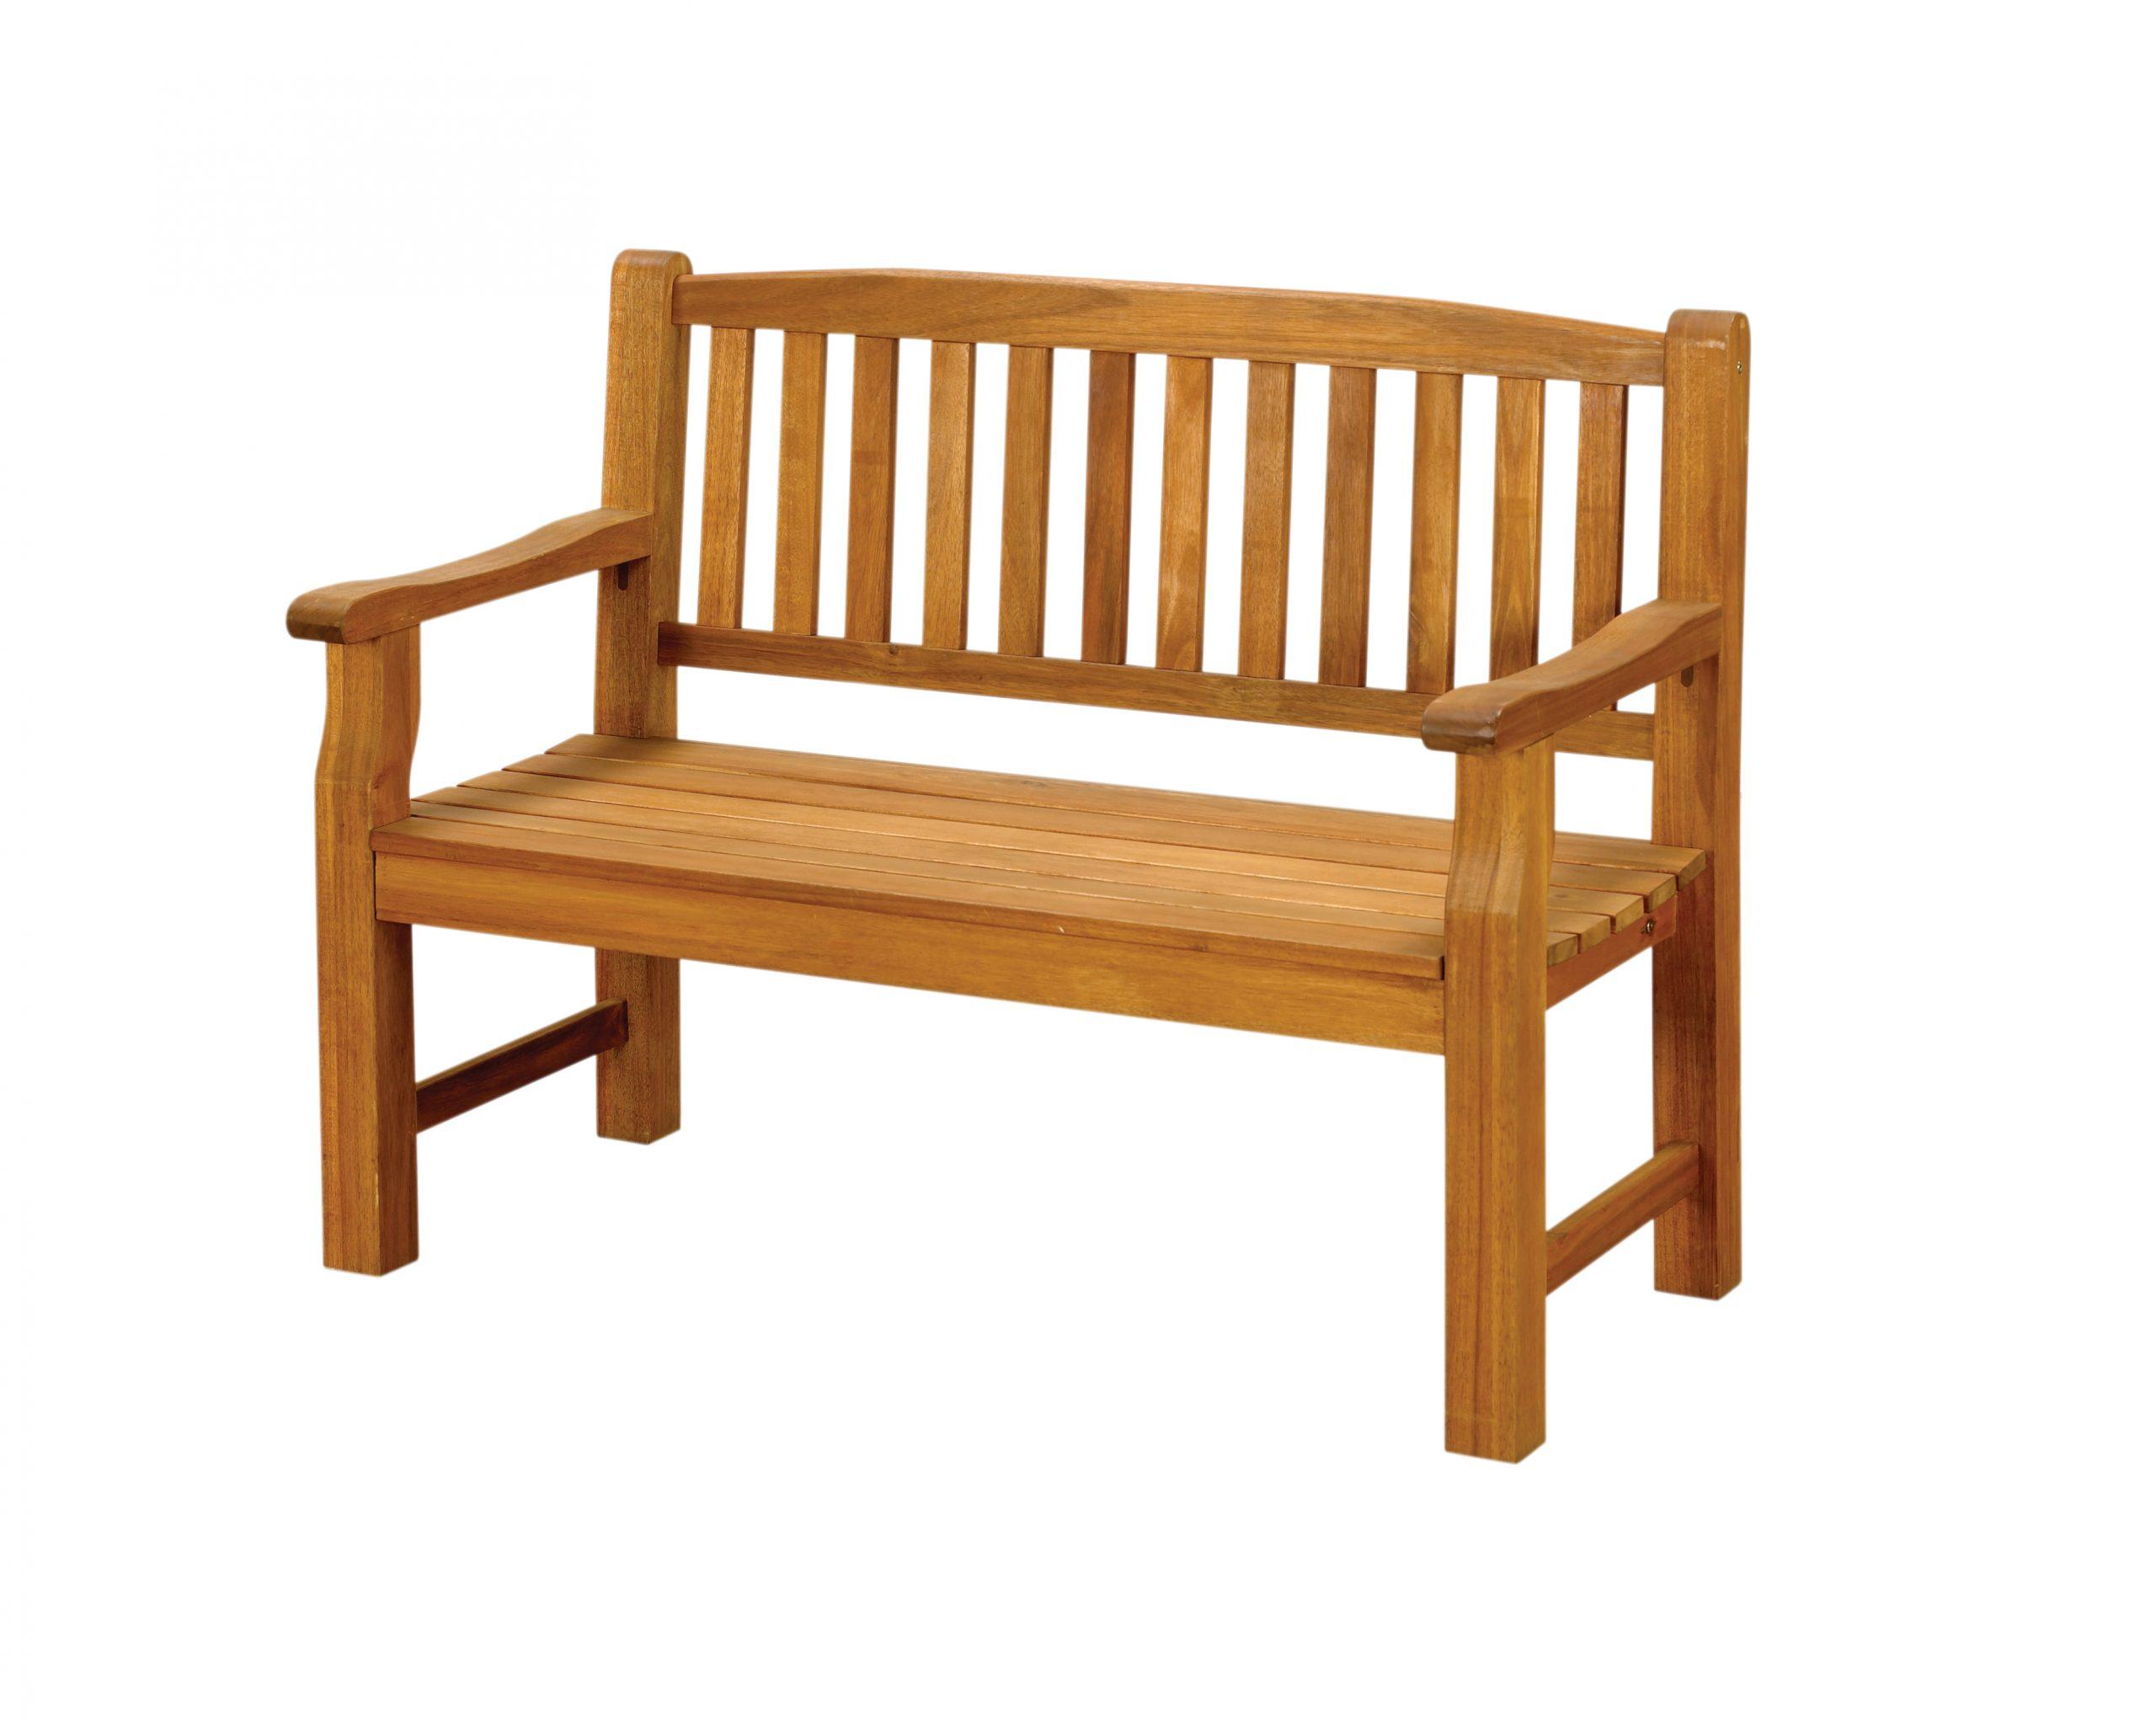 Timber Garden Furniture – Laois Sawmills Ltd Regarding Avoca Wood Garden Benches (View 22 of 25)